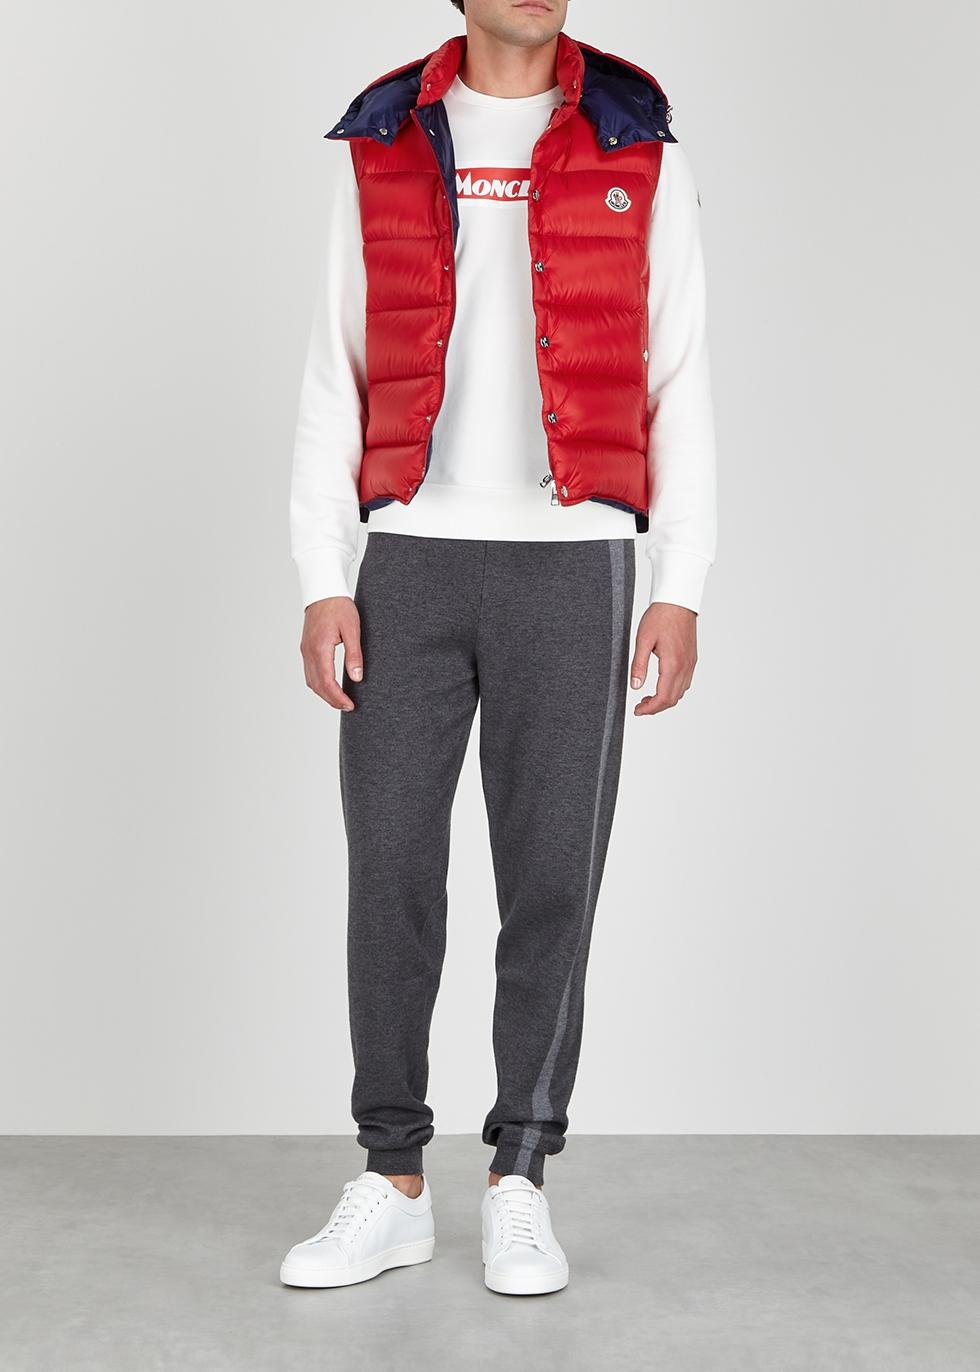 17edba8c83b4e Men's Designer Jackets - Winter Jackets for Men - Harvey Nichols